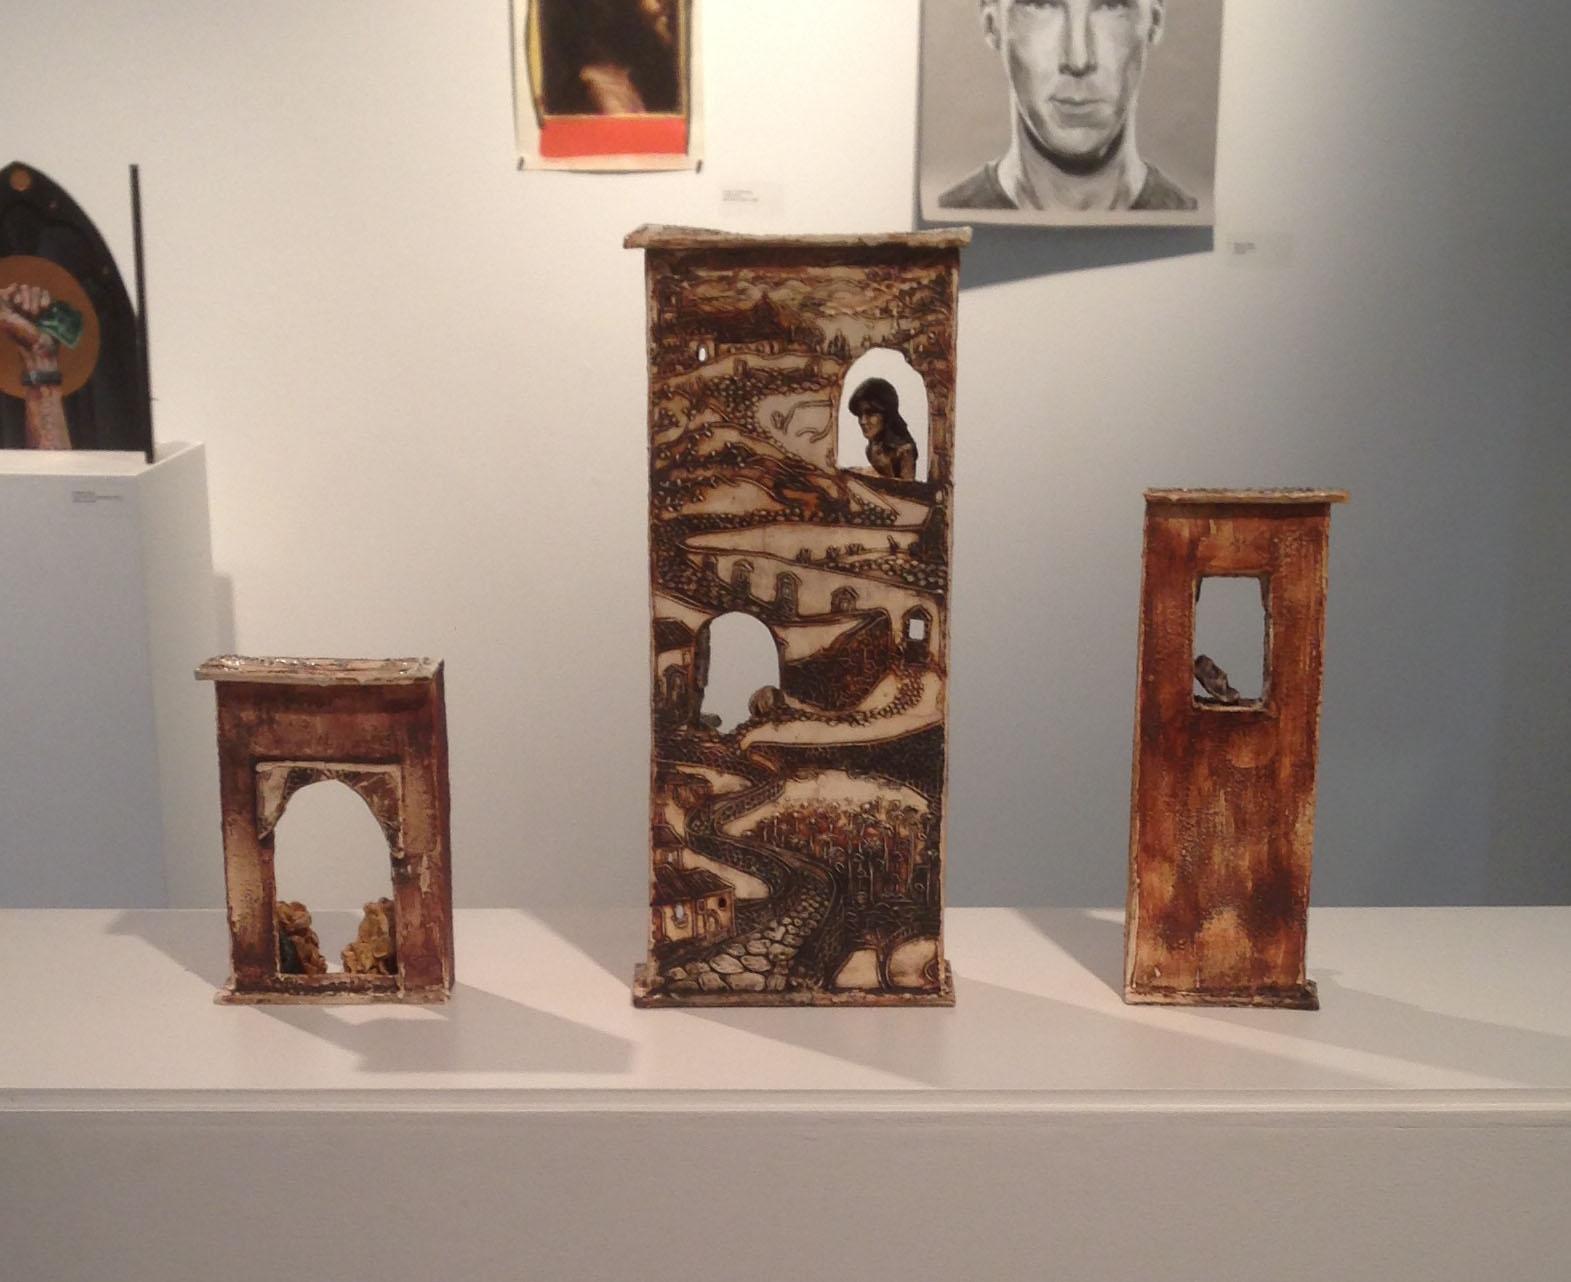 A Journey's Past, porcelain, Fall 2013  Student Juried Show, Lamar Dodd School of Art